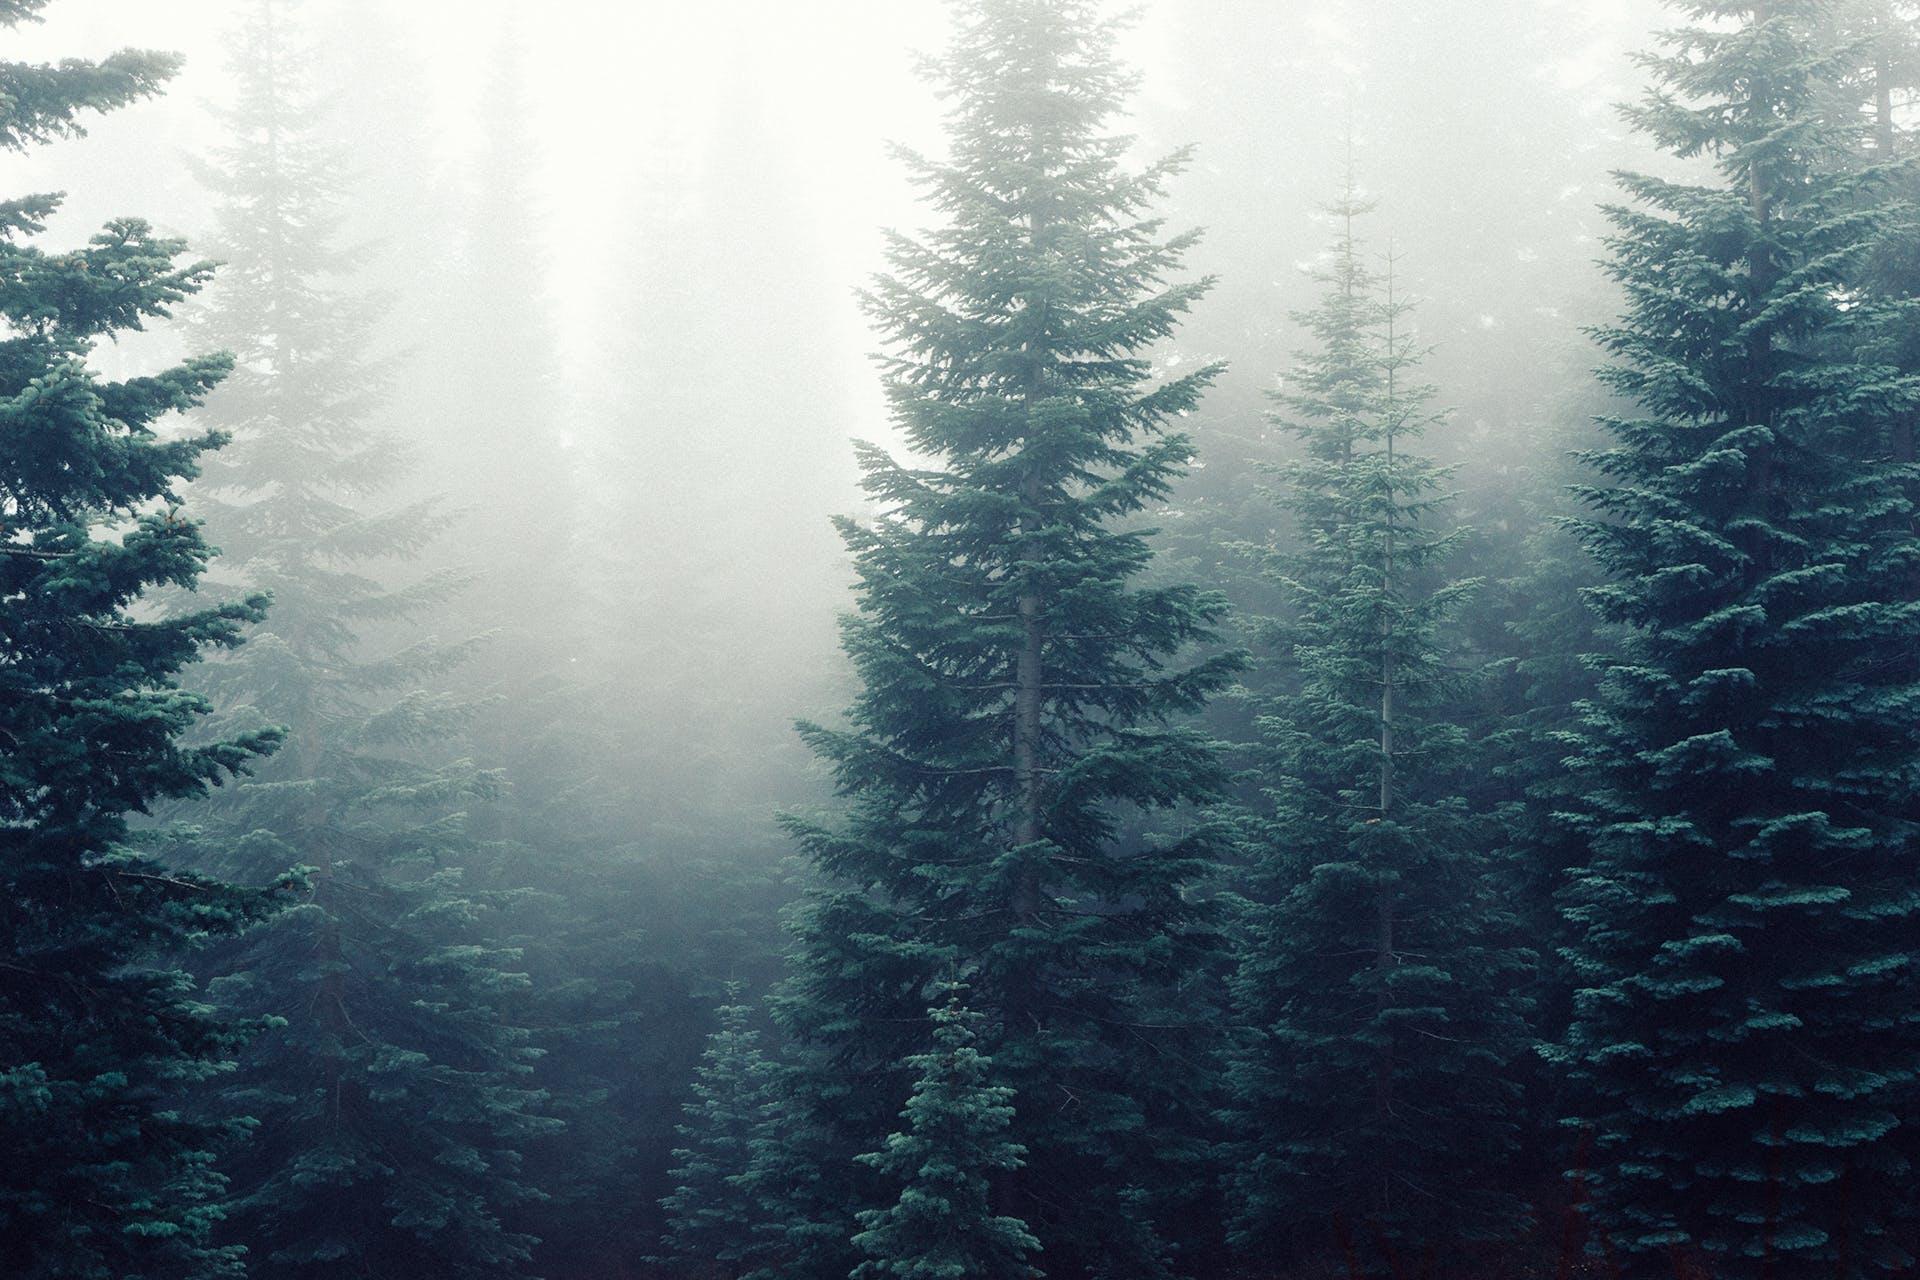 Kostenloses Stock Foto zu bäume, dunstig, mysteriös, nebel